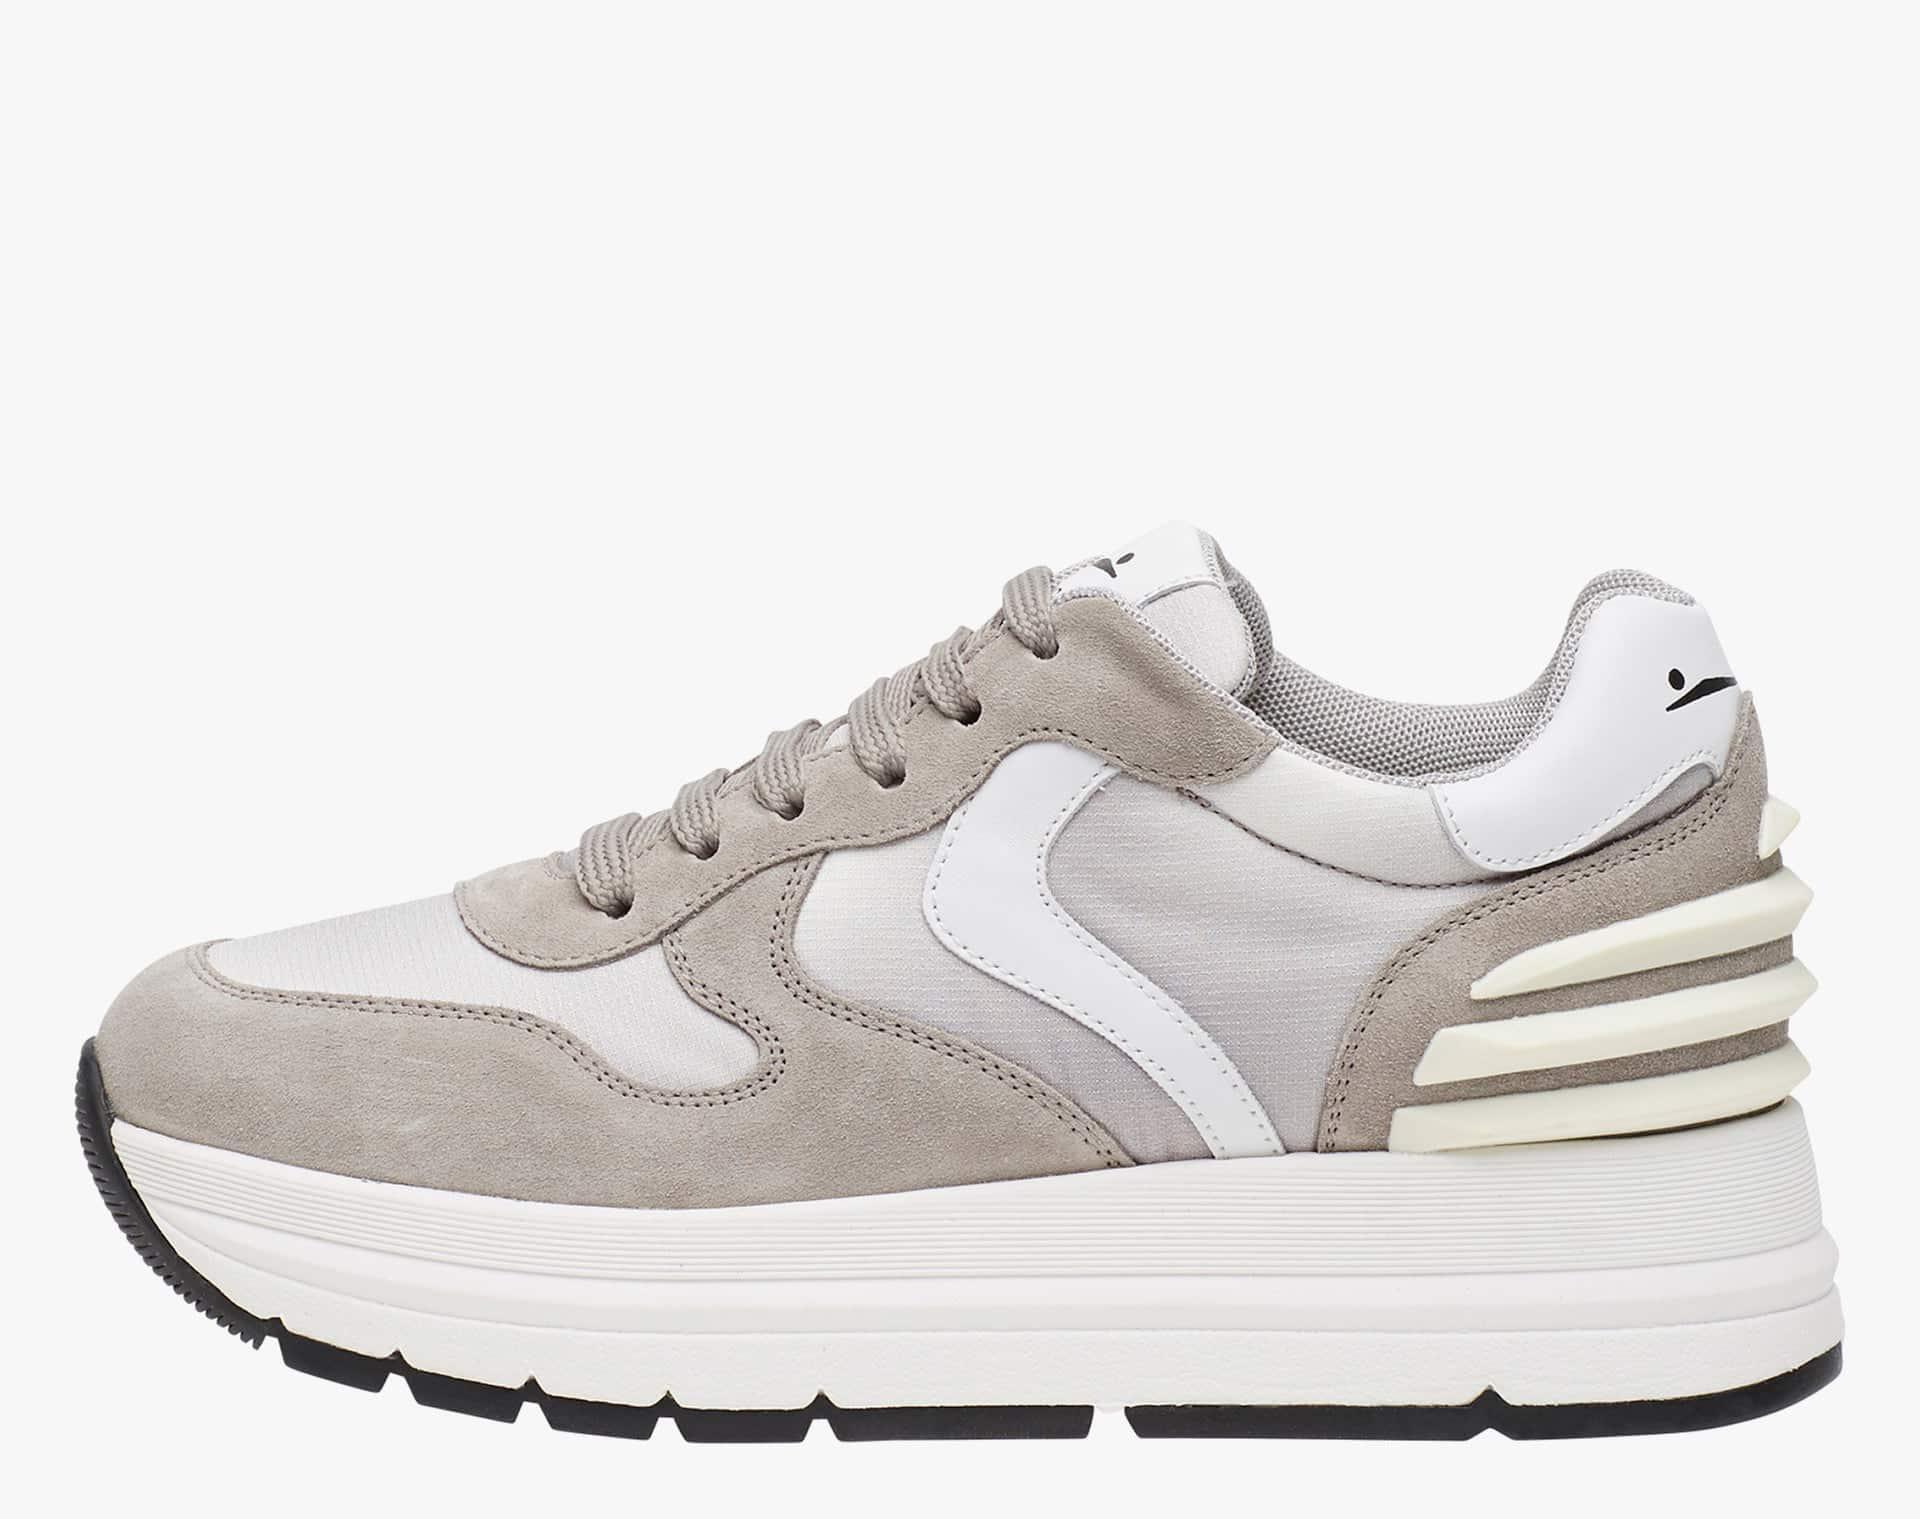 MARAN POWER - Sneaker in velour e tessuto tecnico - Tortora